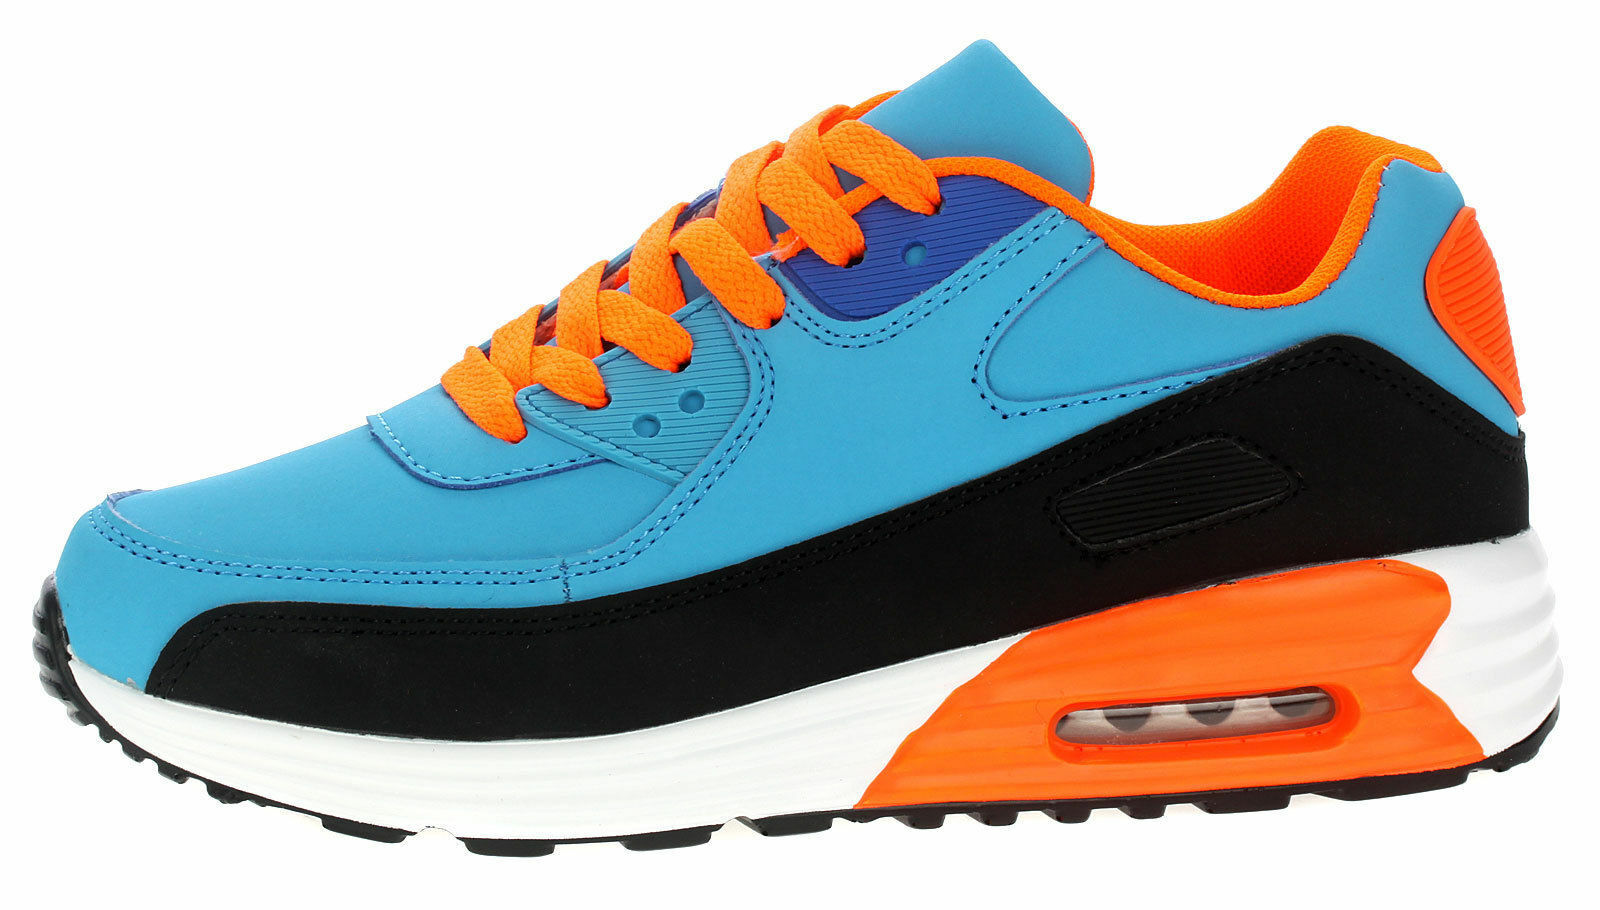 31. schwarz-blau-orange